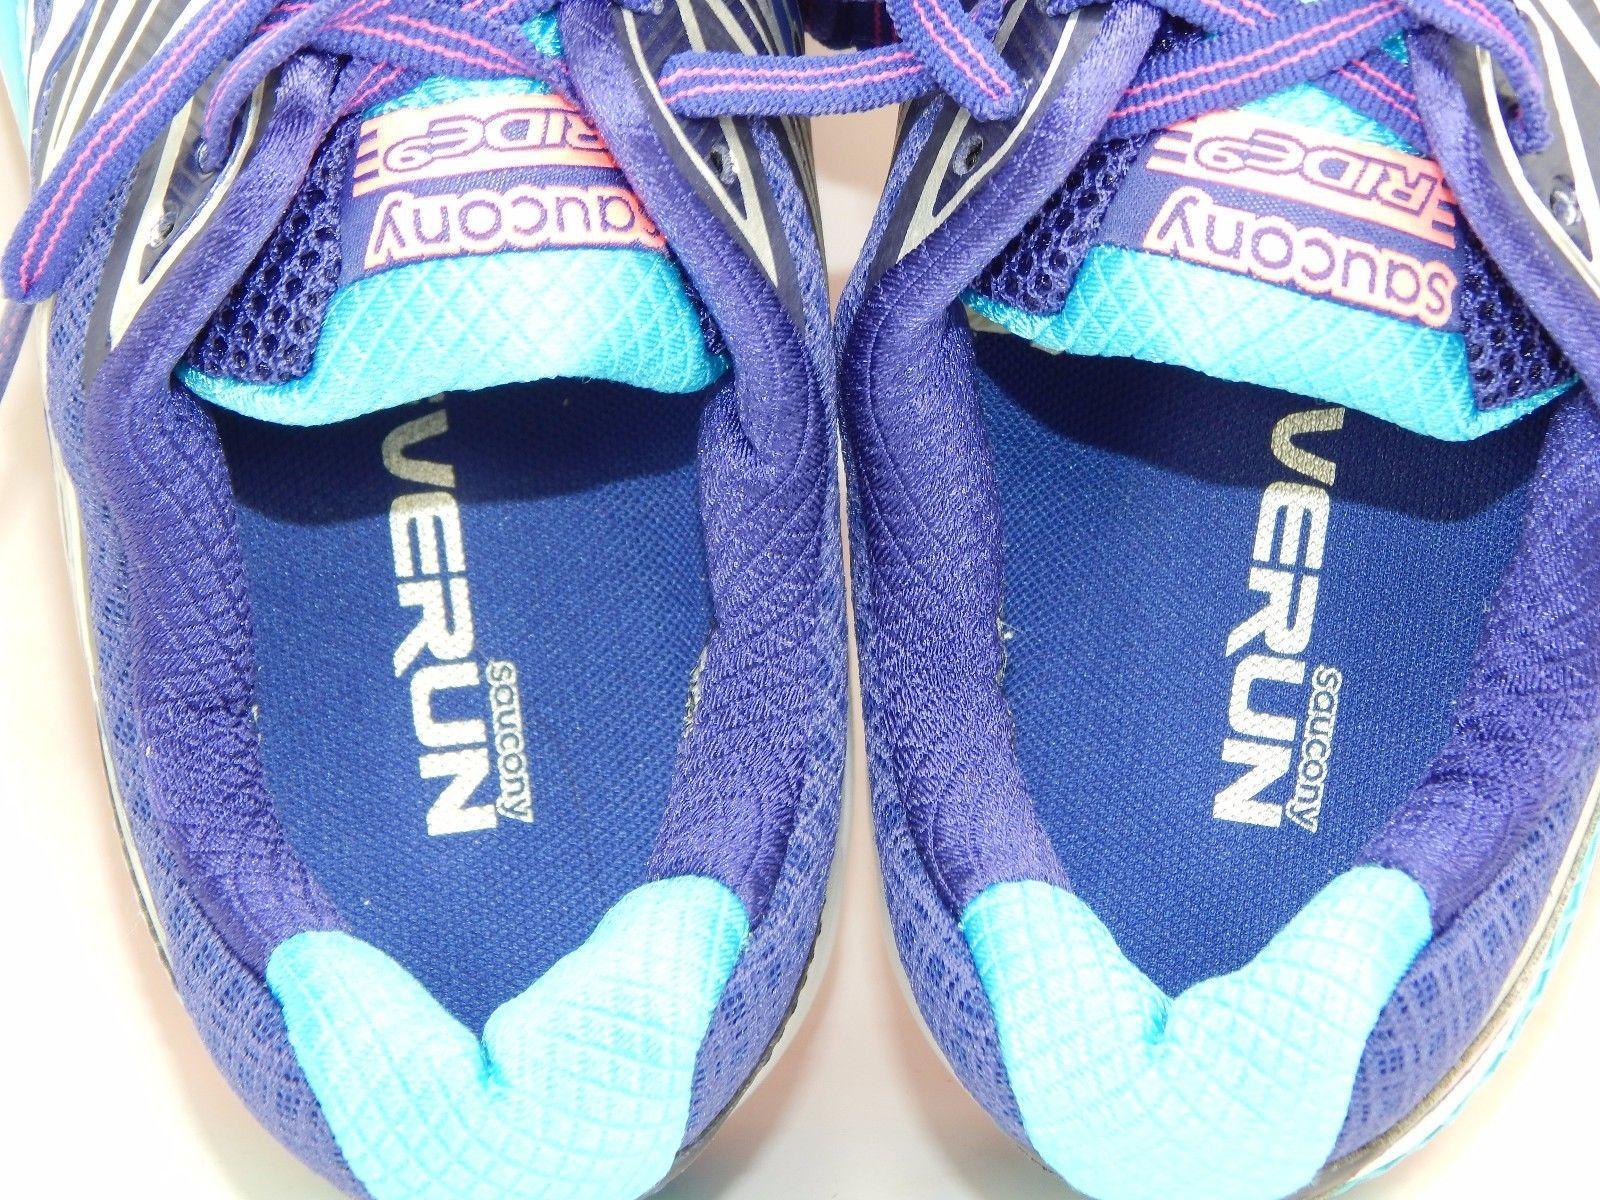 Saucony Ride 9 Women's Running Shoes Size US 9 M (B) EU 40.5 Blue S10319-2